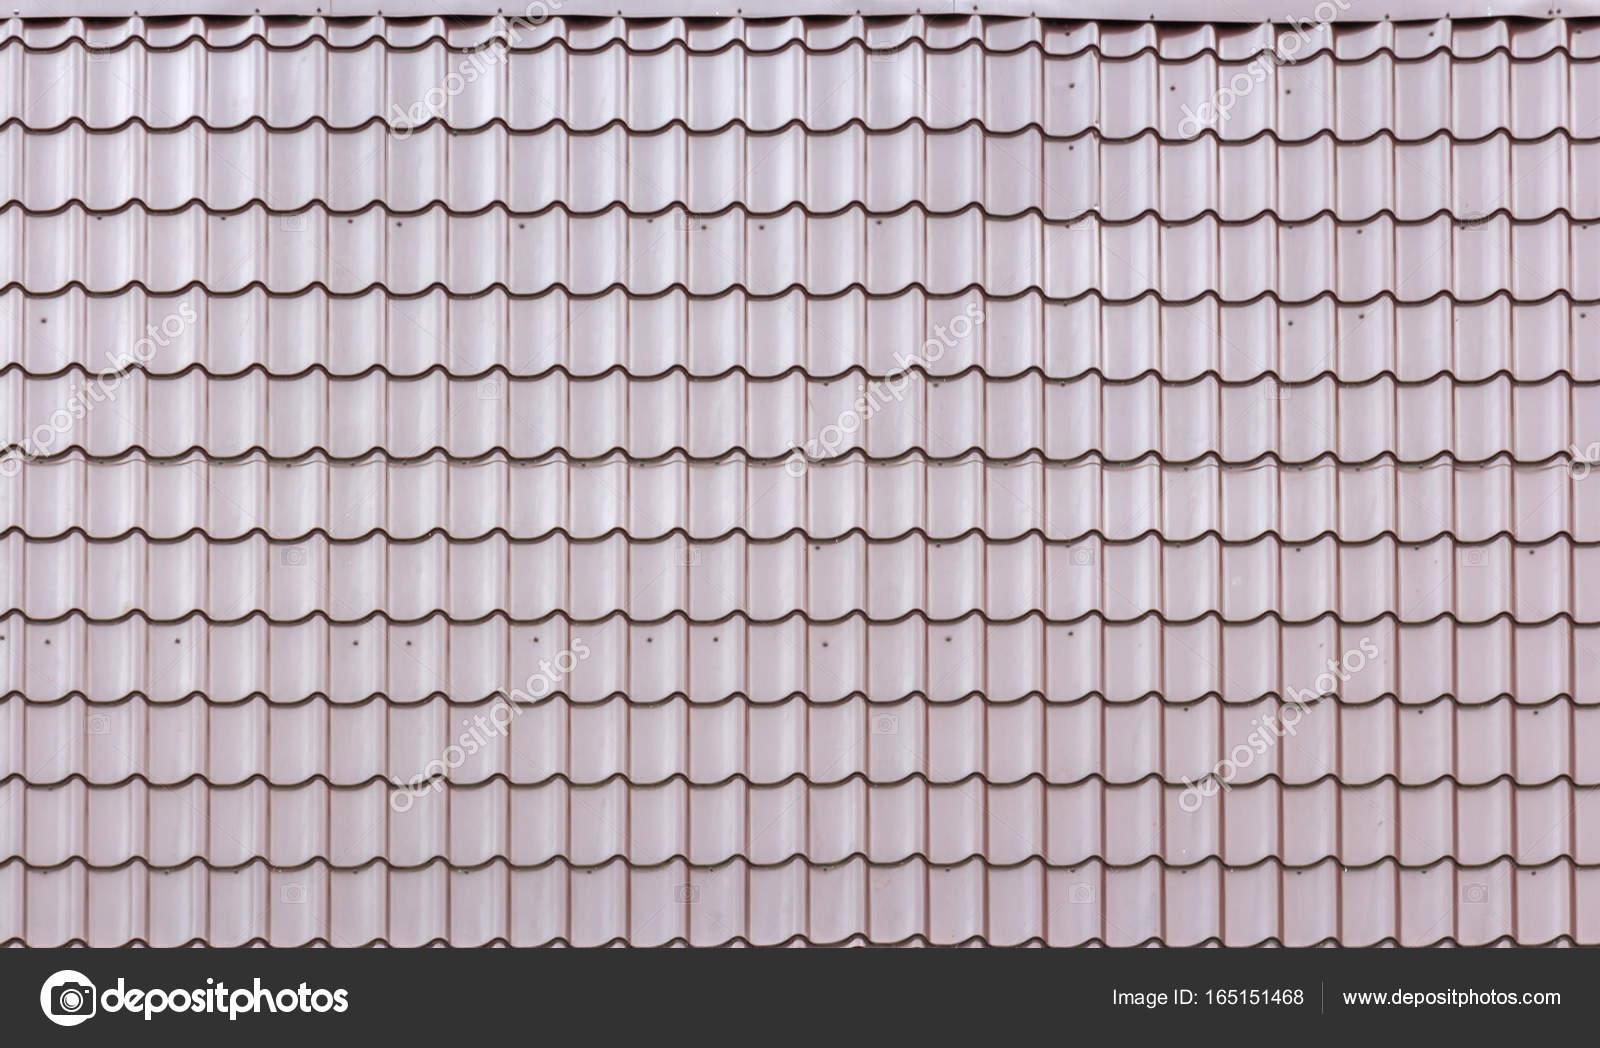 Texture le mattonelle moderne u2014 foto stock © kellkinel #165151468